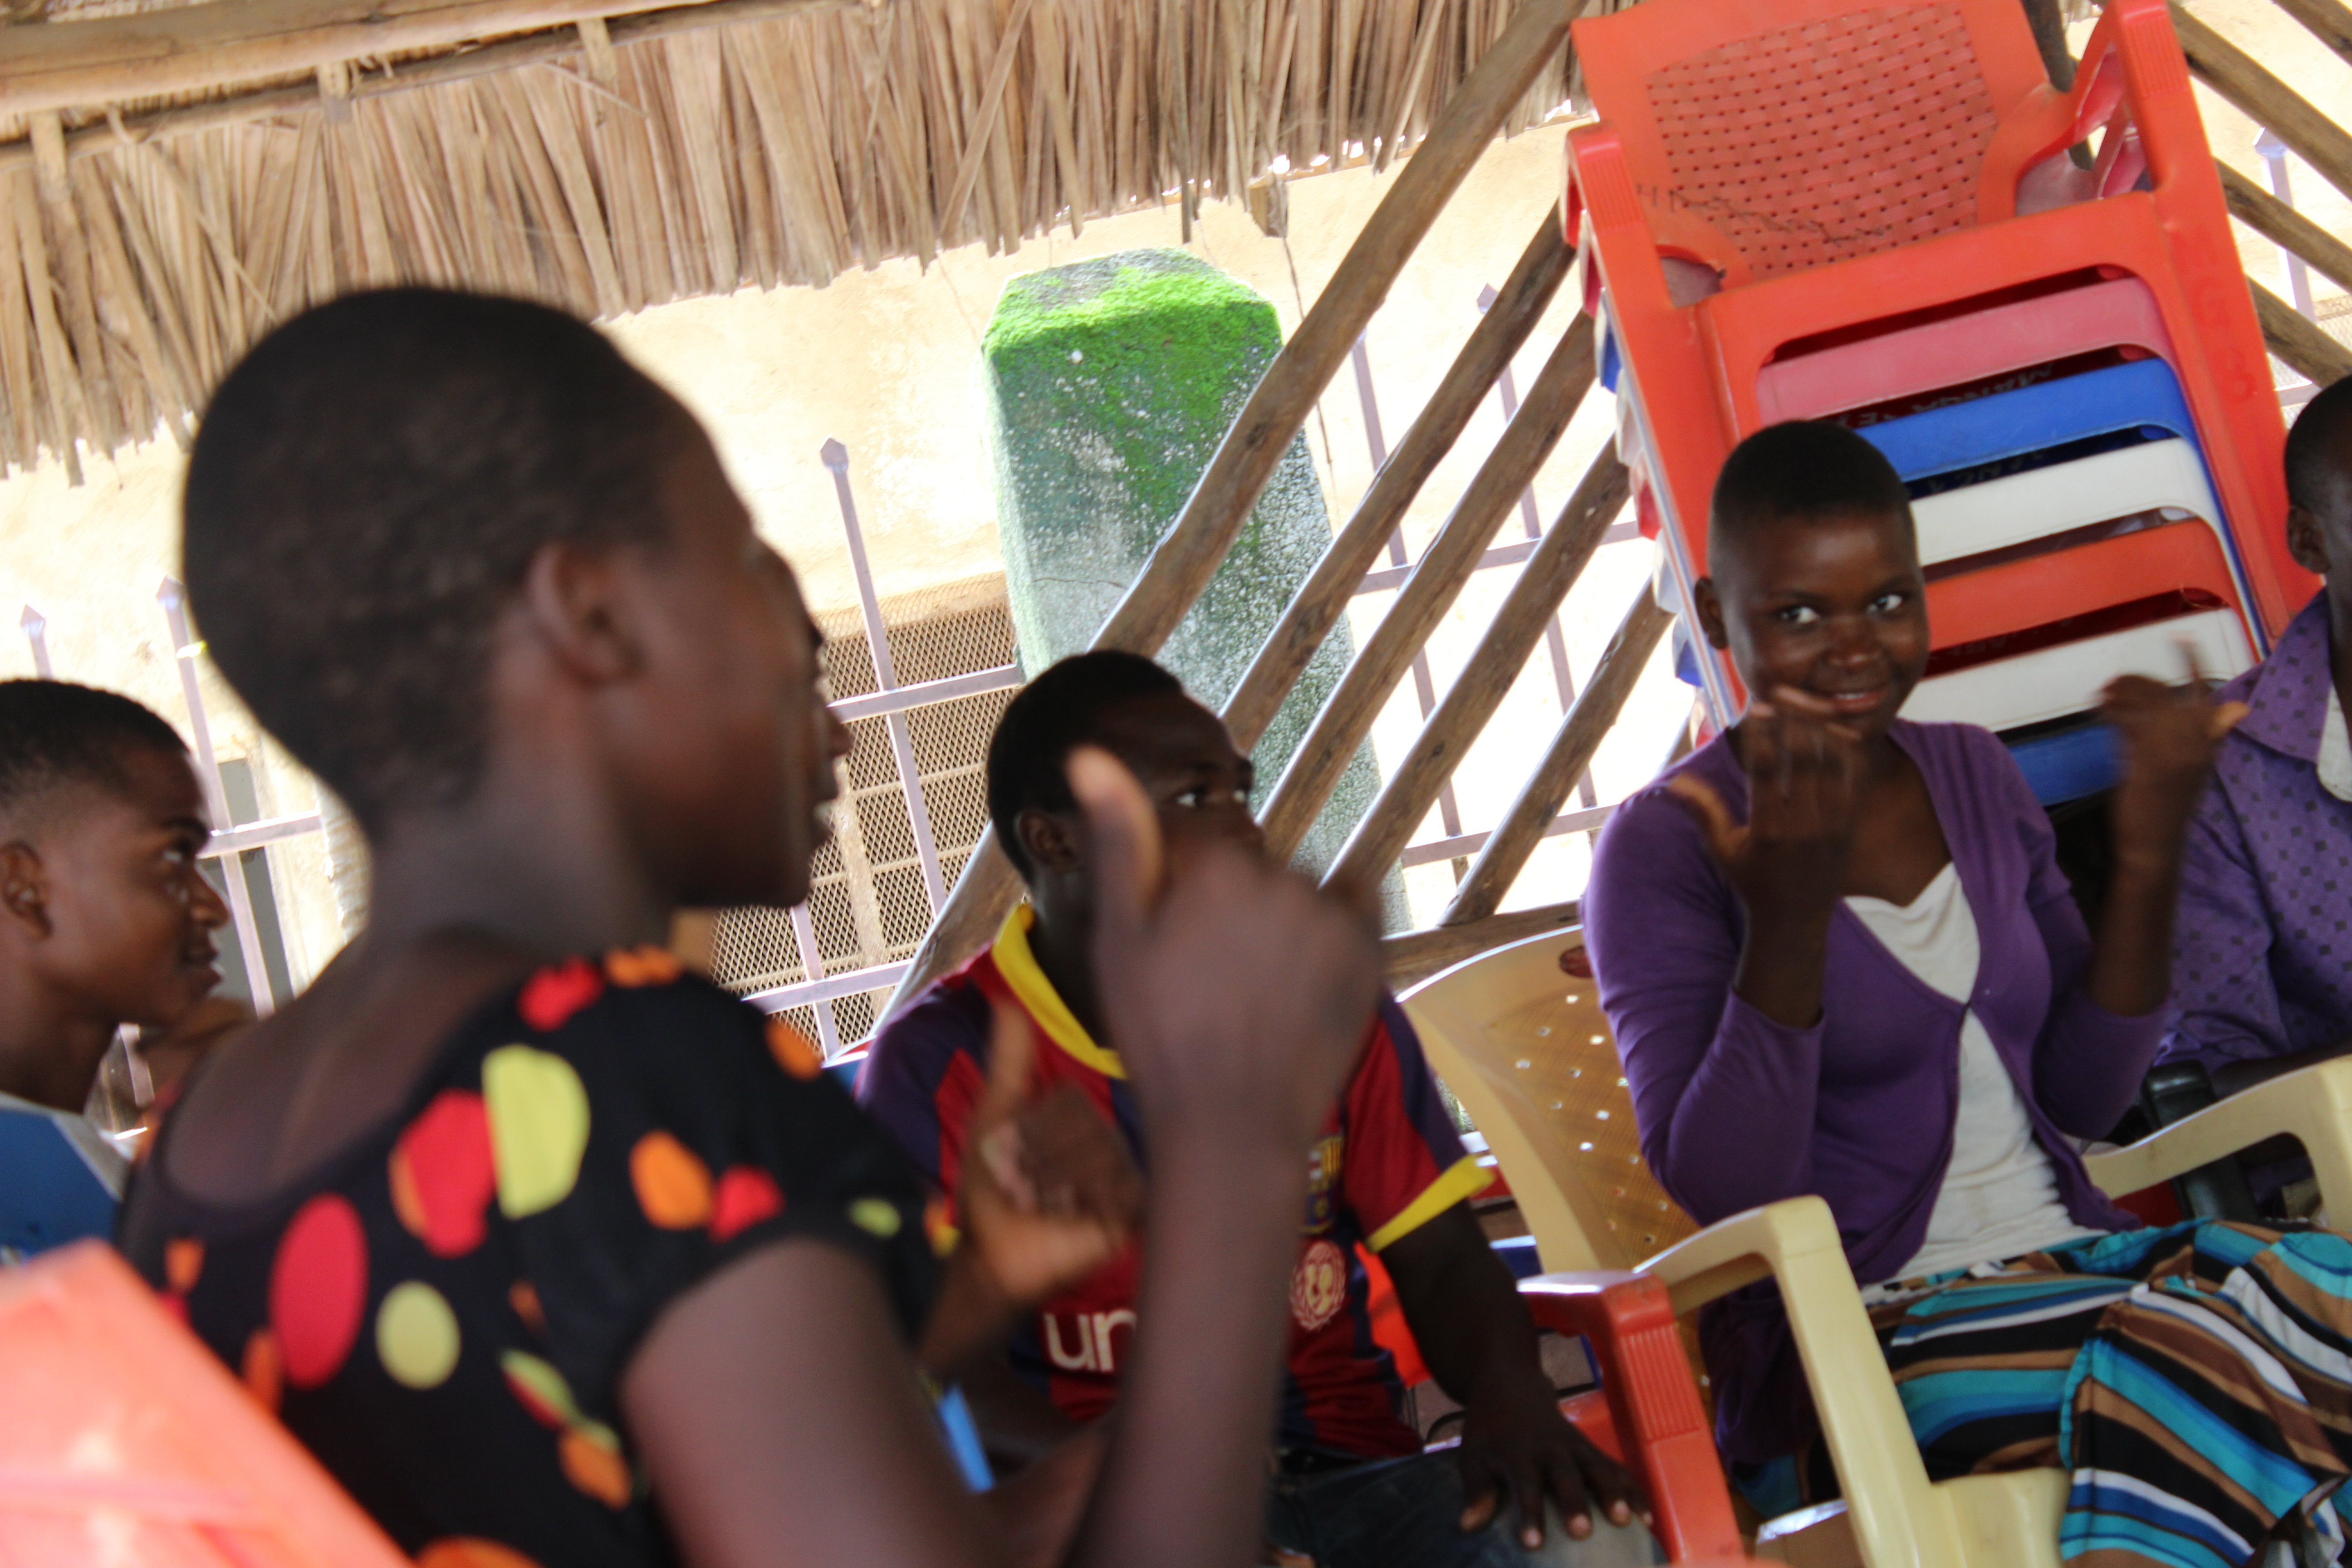 Unsere Partner Jugendliche in Tansania